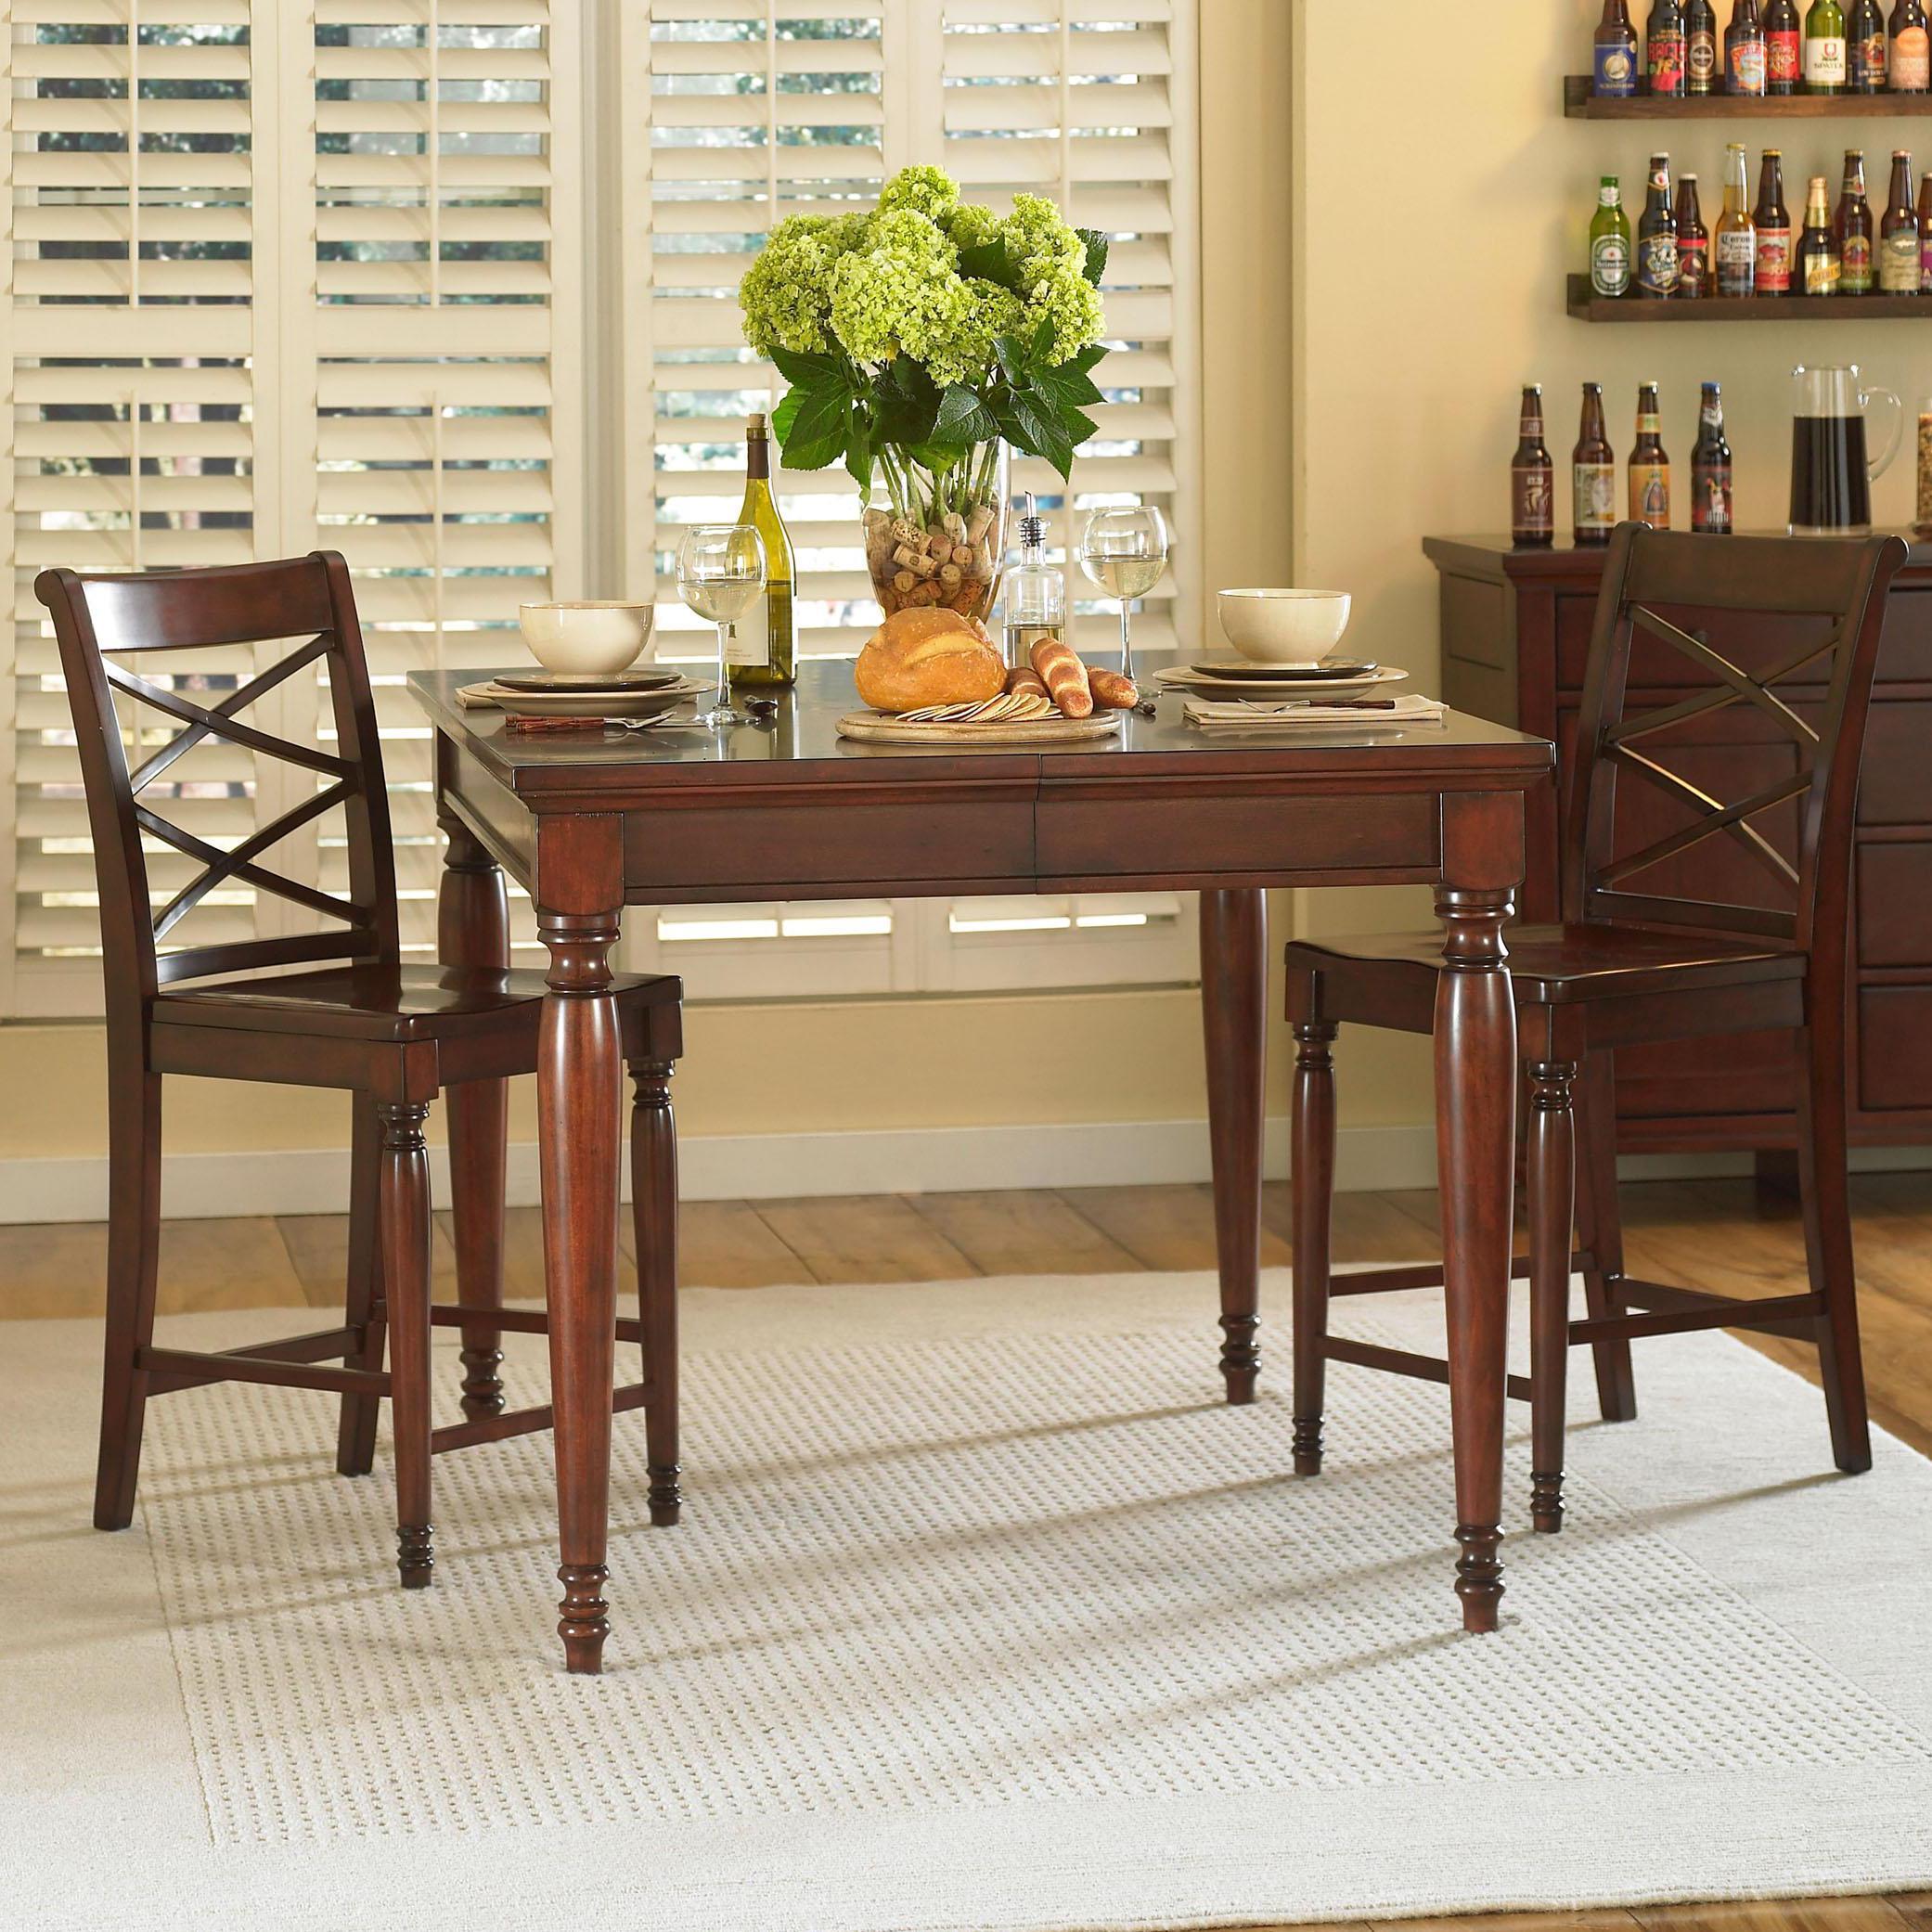 Cambridge 3 Pc. Pub Table Set by Aspenhome at Walker's Furniture